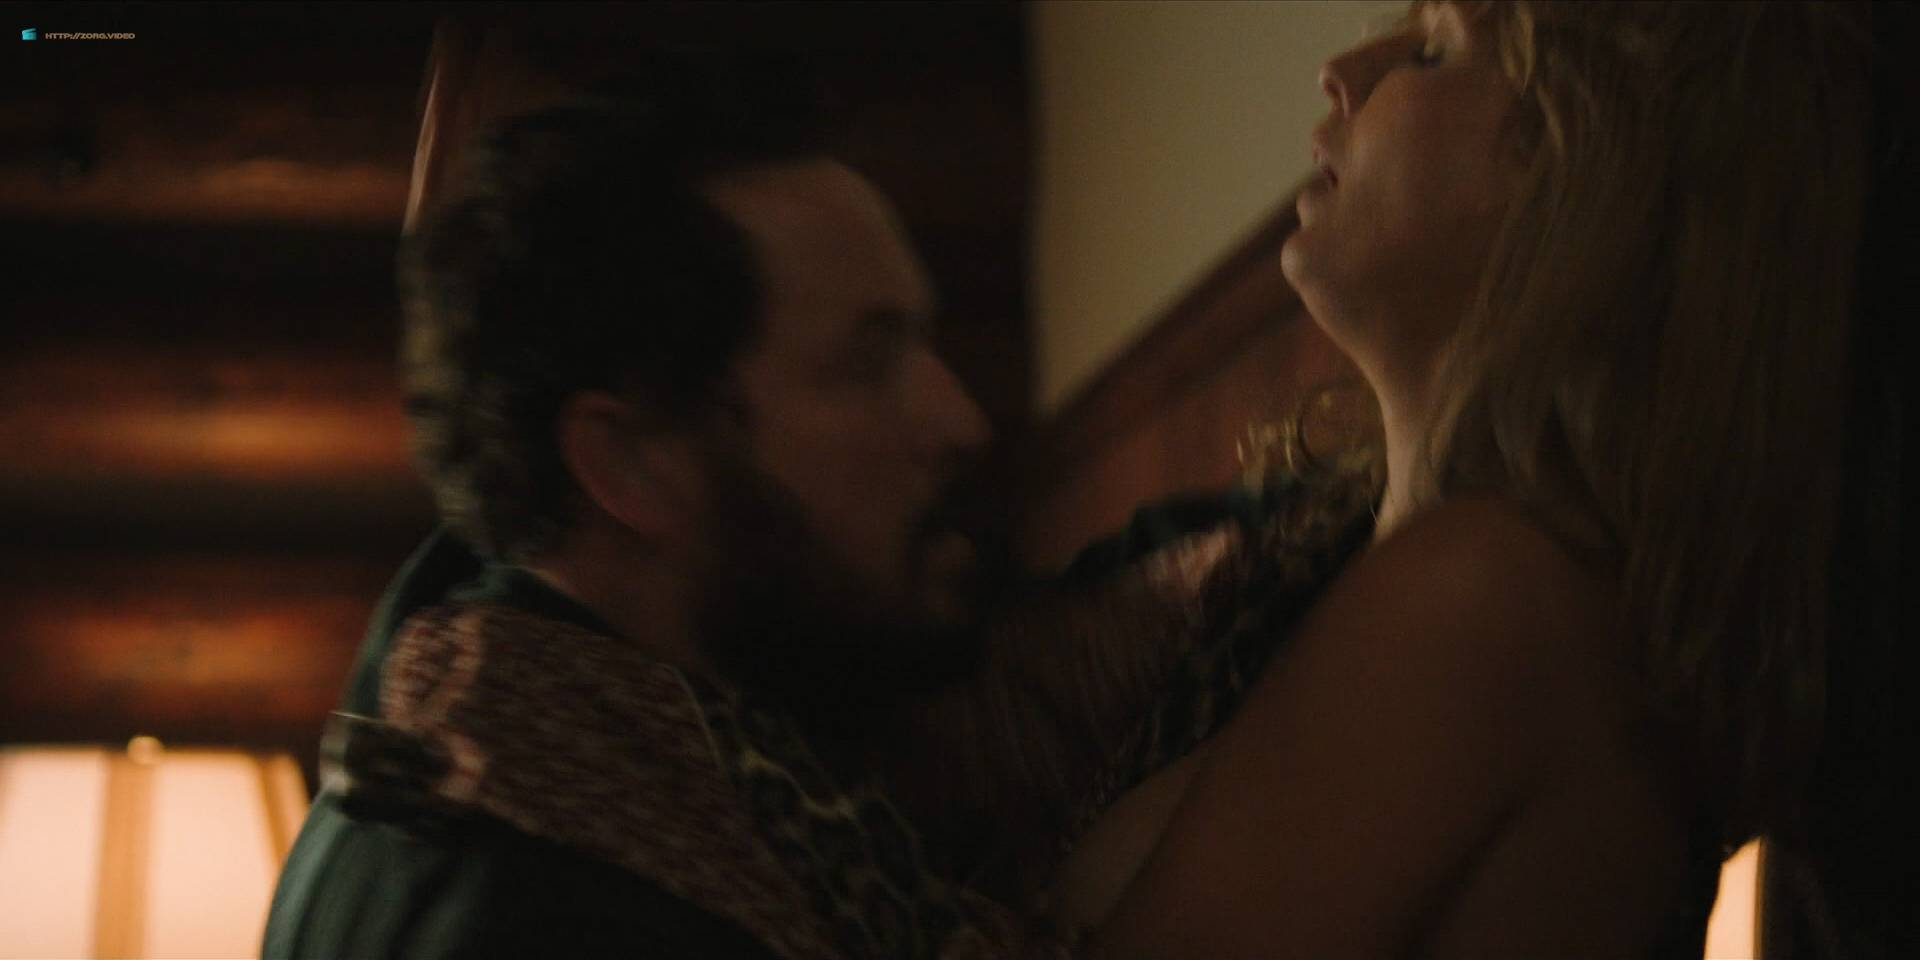 Threesome sex bondage free videos